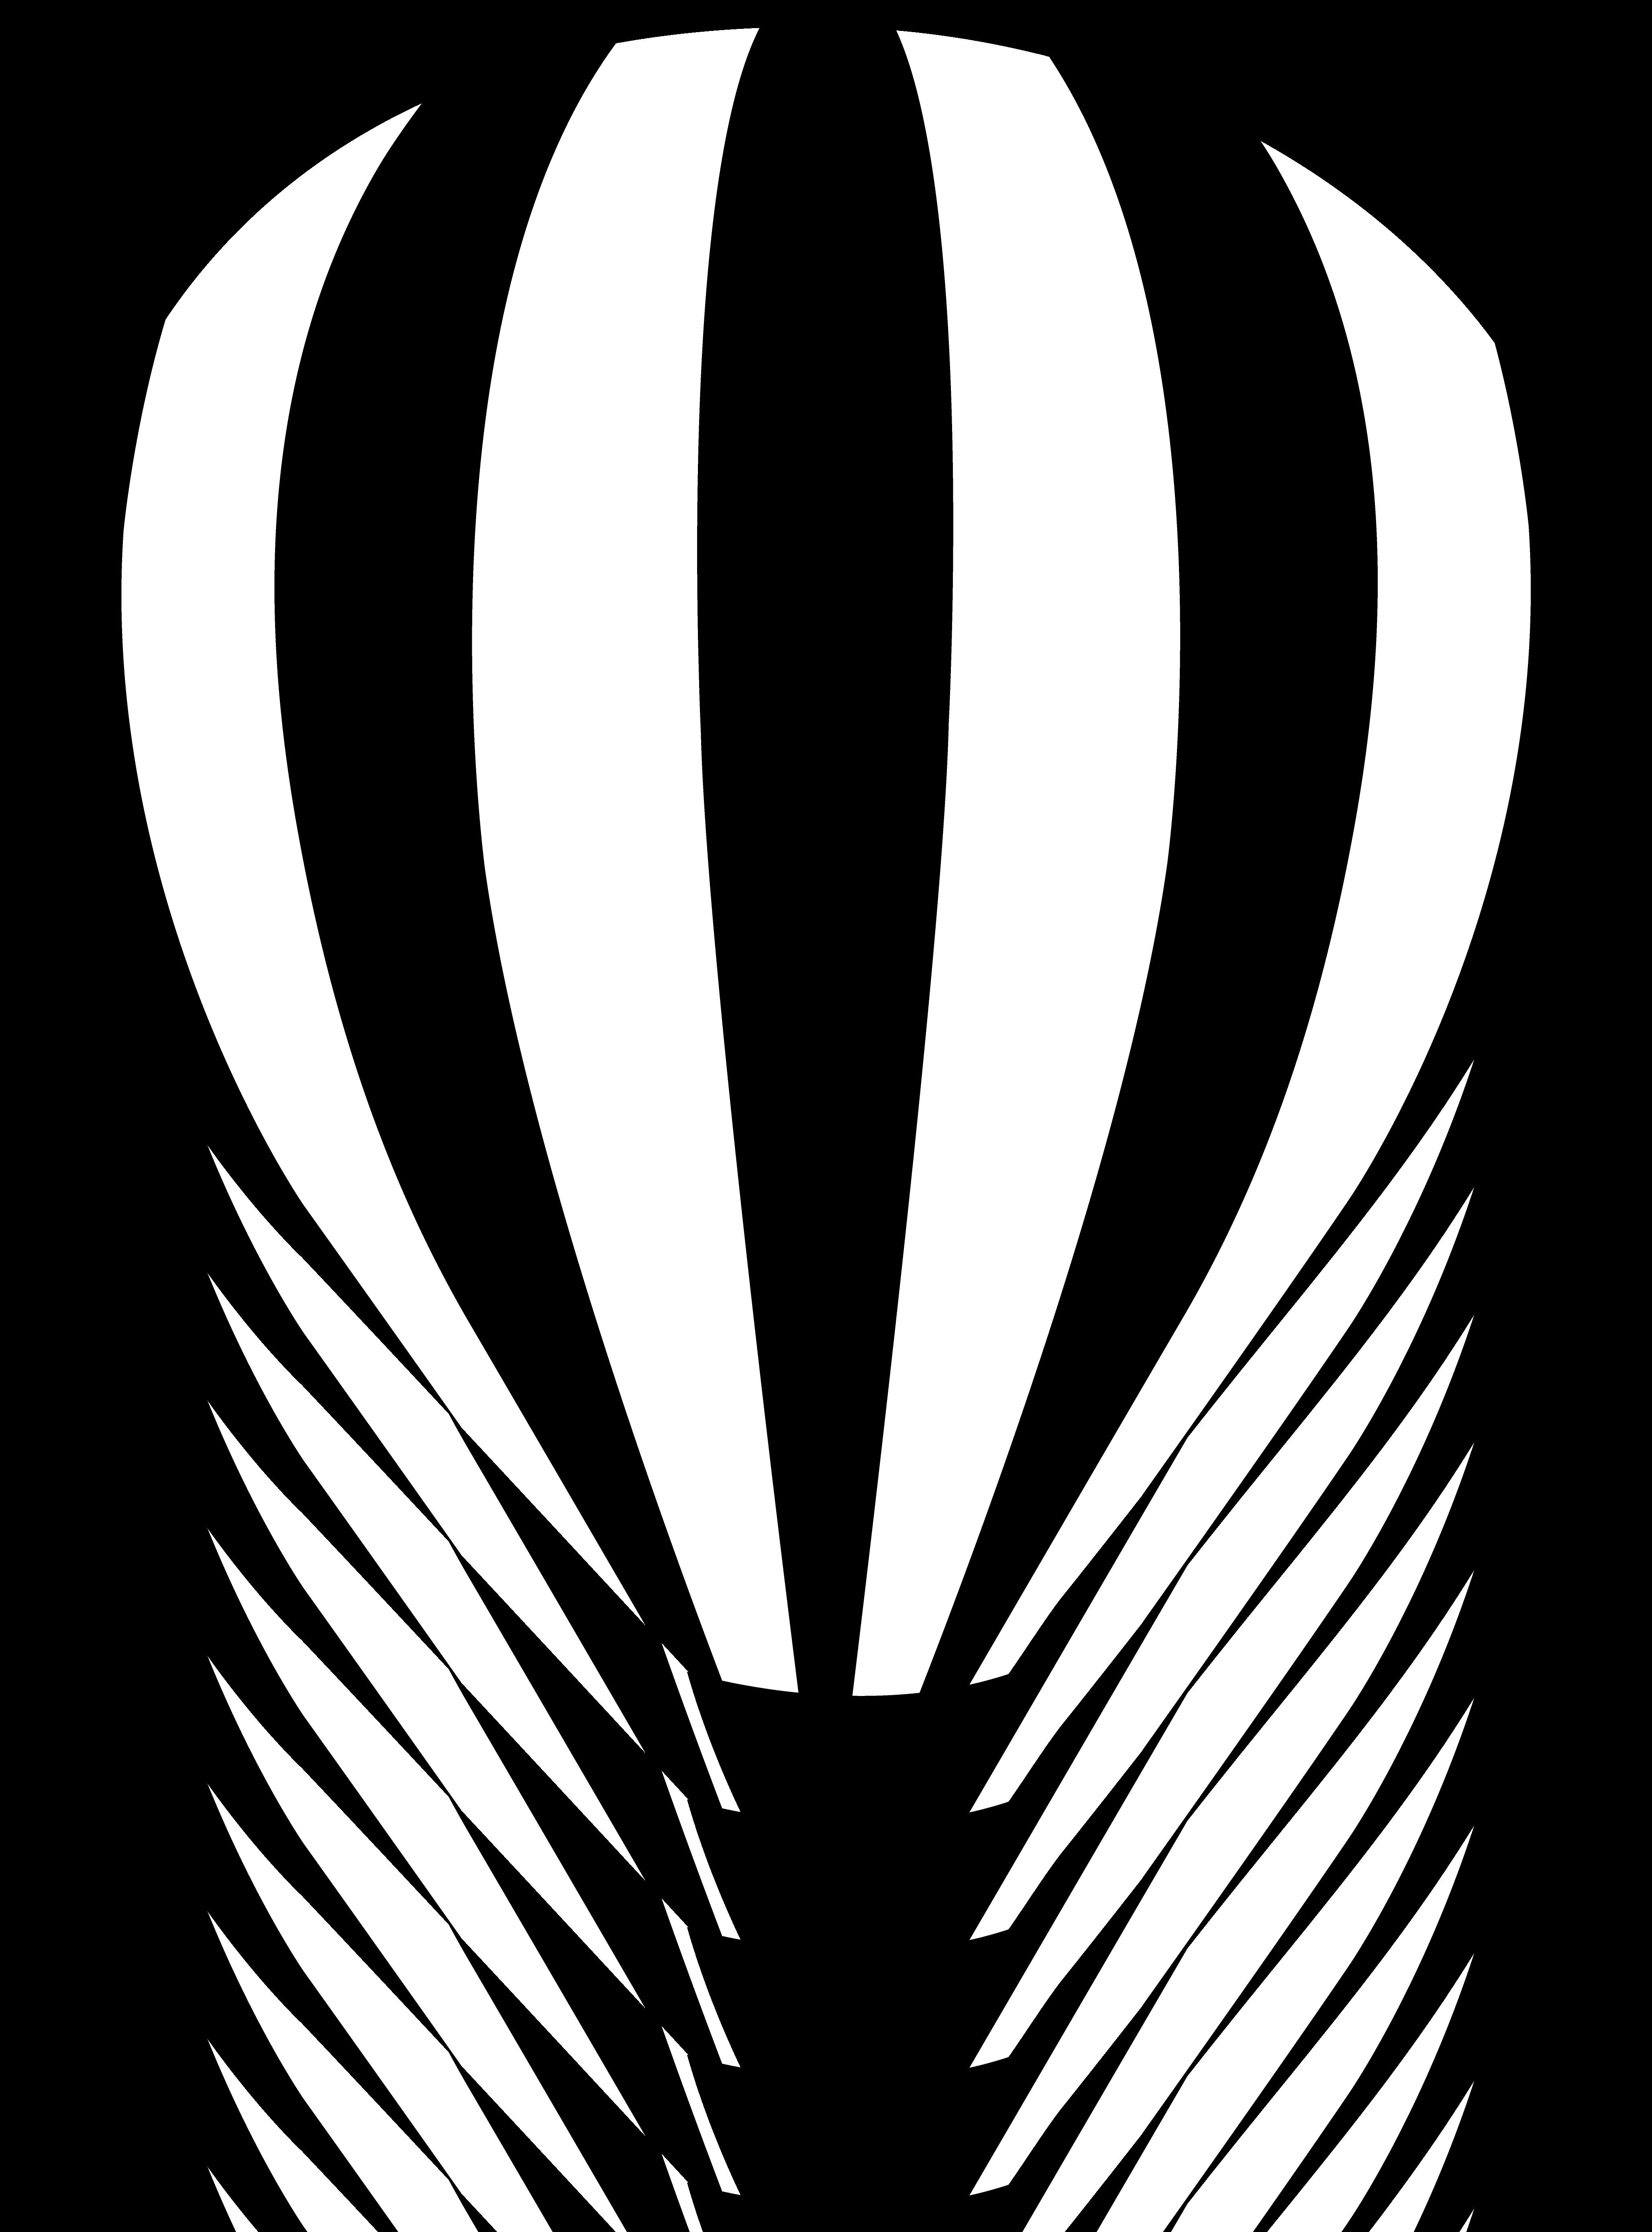 Free hot air balloon clipart black and white graphic black and white download Free Hot Air Balloon Clipart, Download Free Clip Art, Free Clip Art ... graphic black and white download